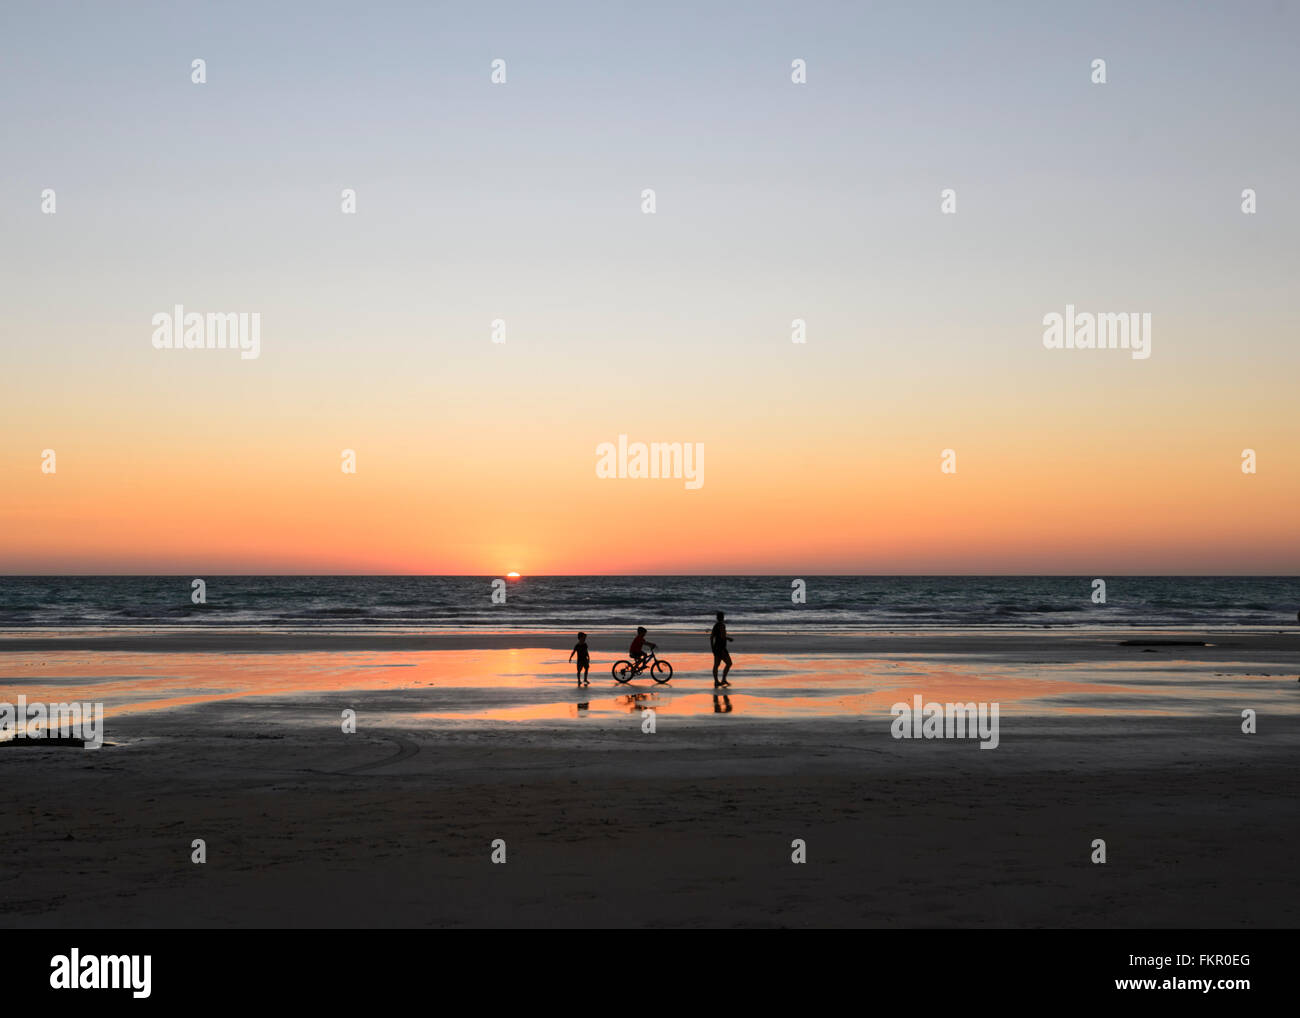 Familie bei Sonnenuntergang am Cable Beach in Broome, Kimberley Region, Westaustralien, WA, Australien Stockbild